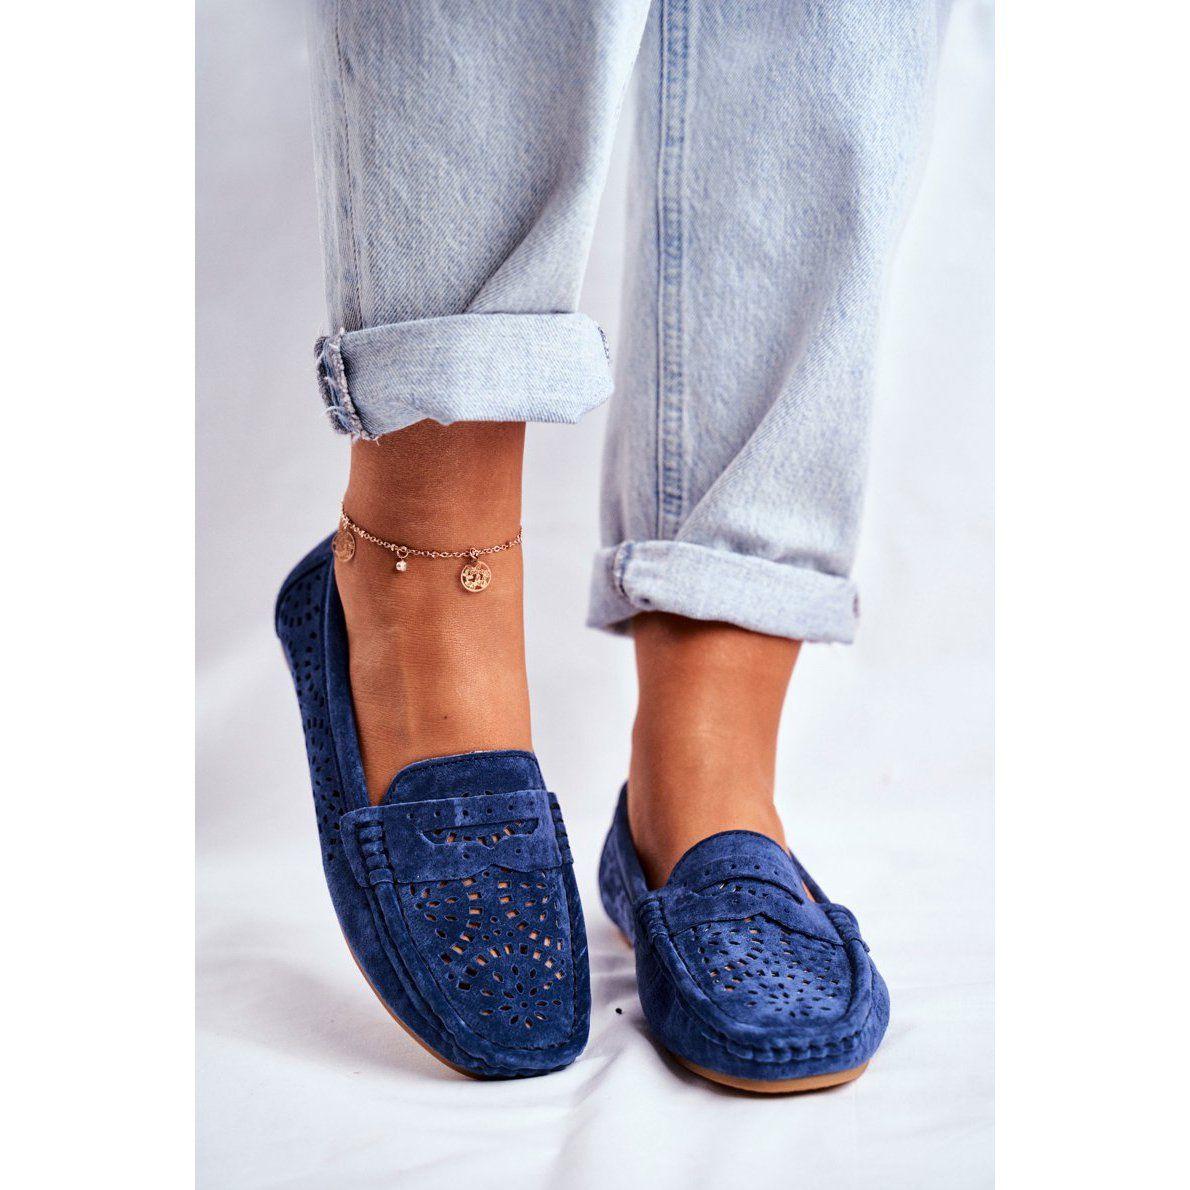 S Barski Mokasyny Damskie Azurowe Skorzane Granatowe Salem Loafers Shoes Mule Shoe